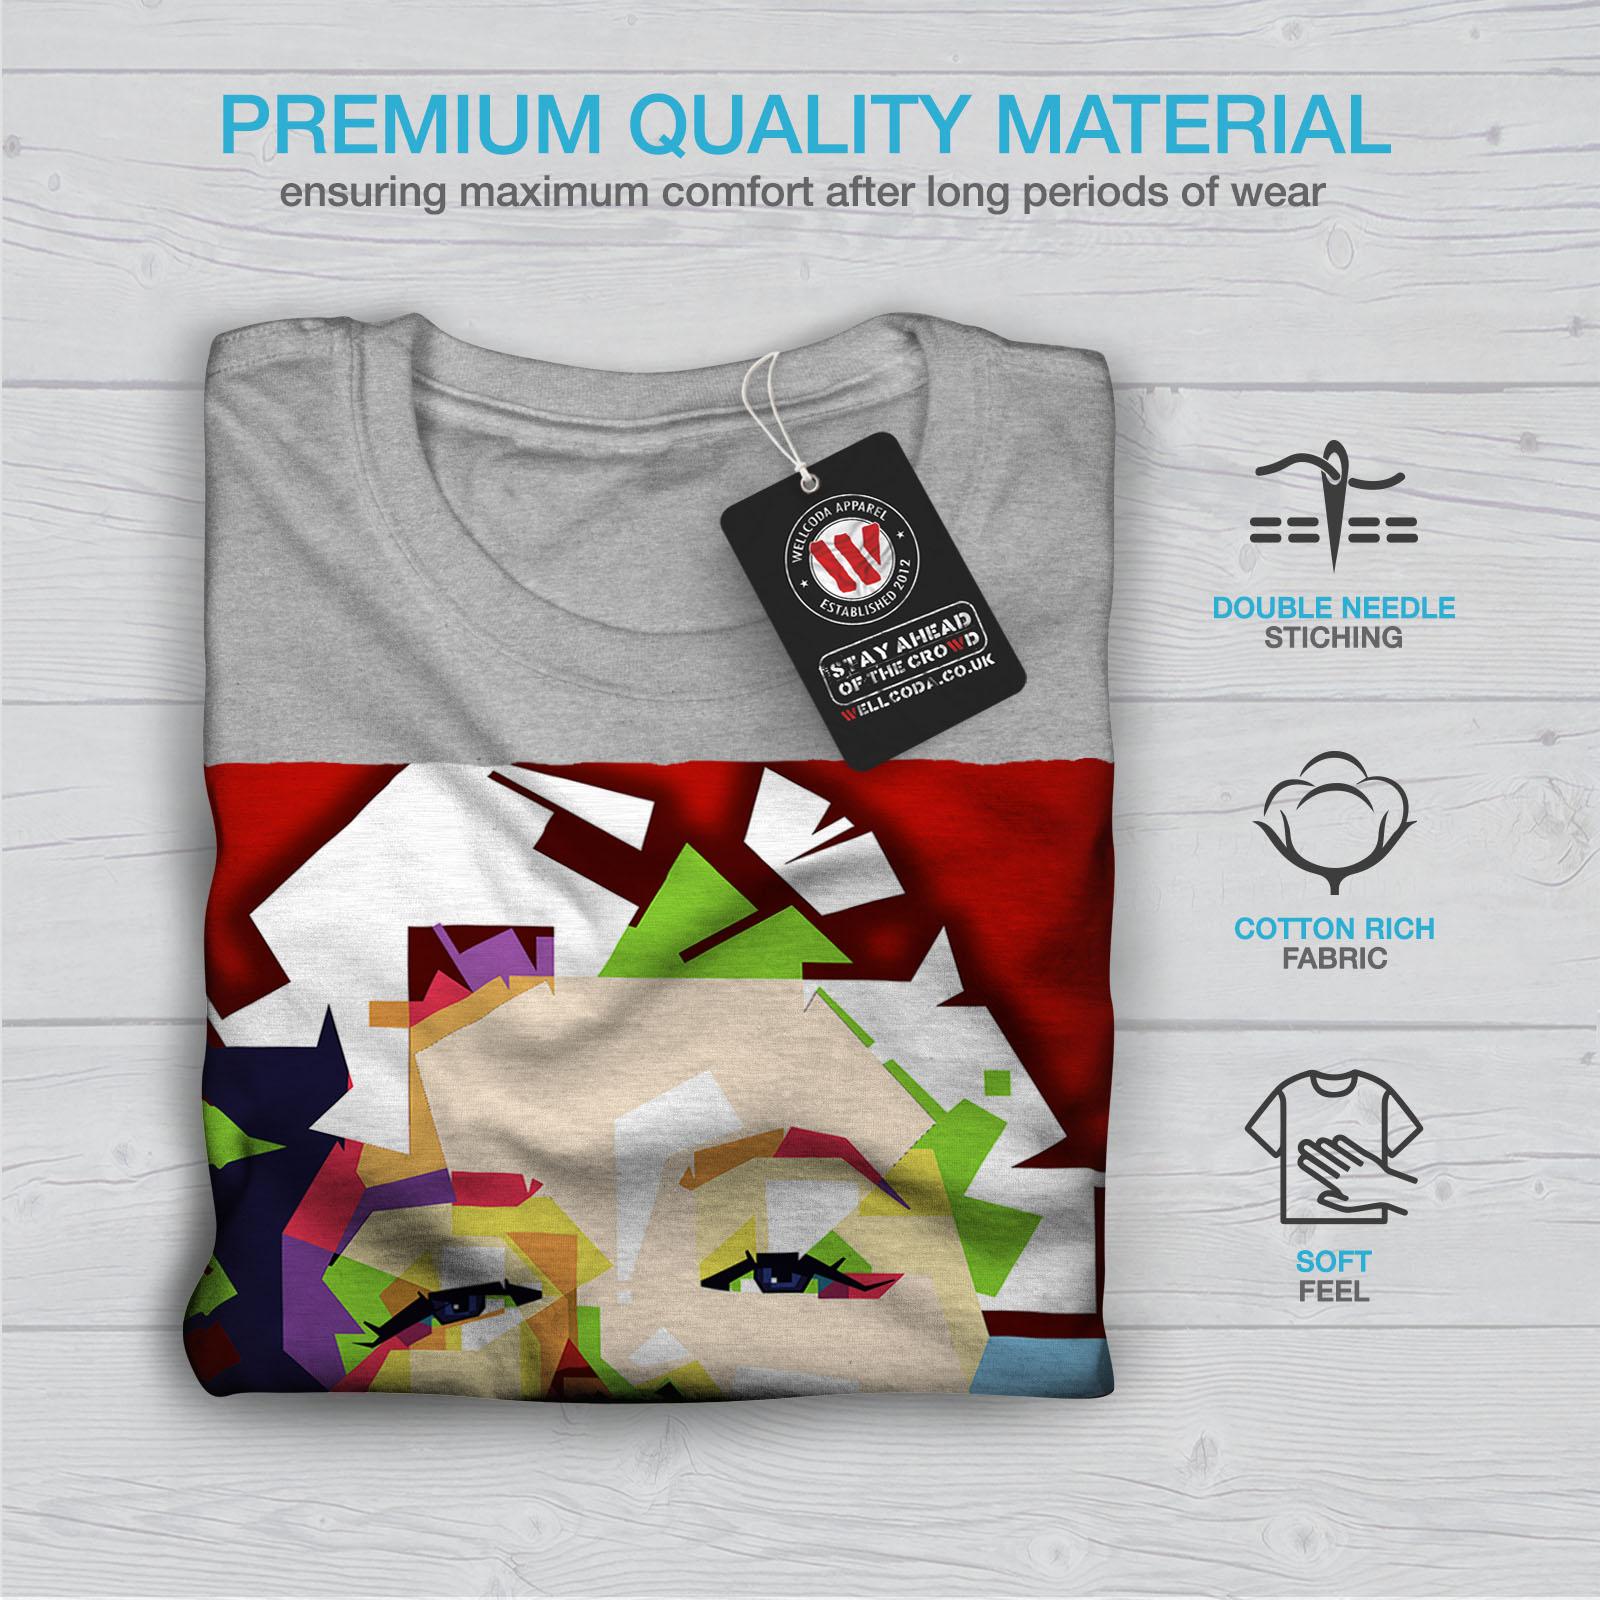 Wellcoda Marilyn Retro Photo Mens T-shirt Urban Graphic Design Printed Tee